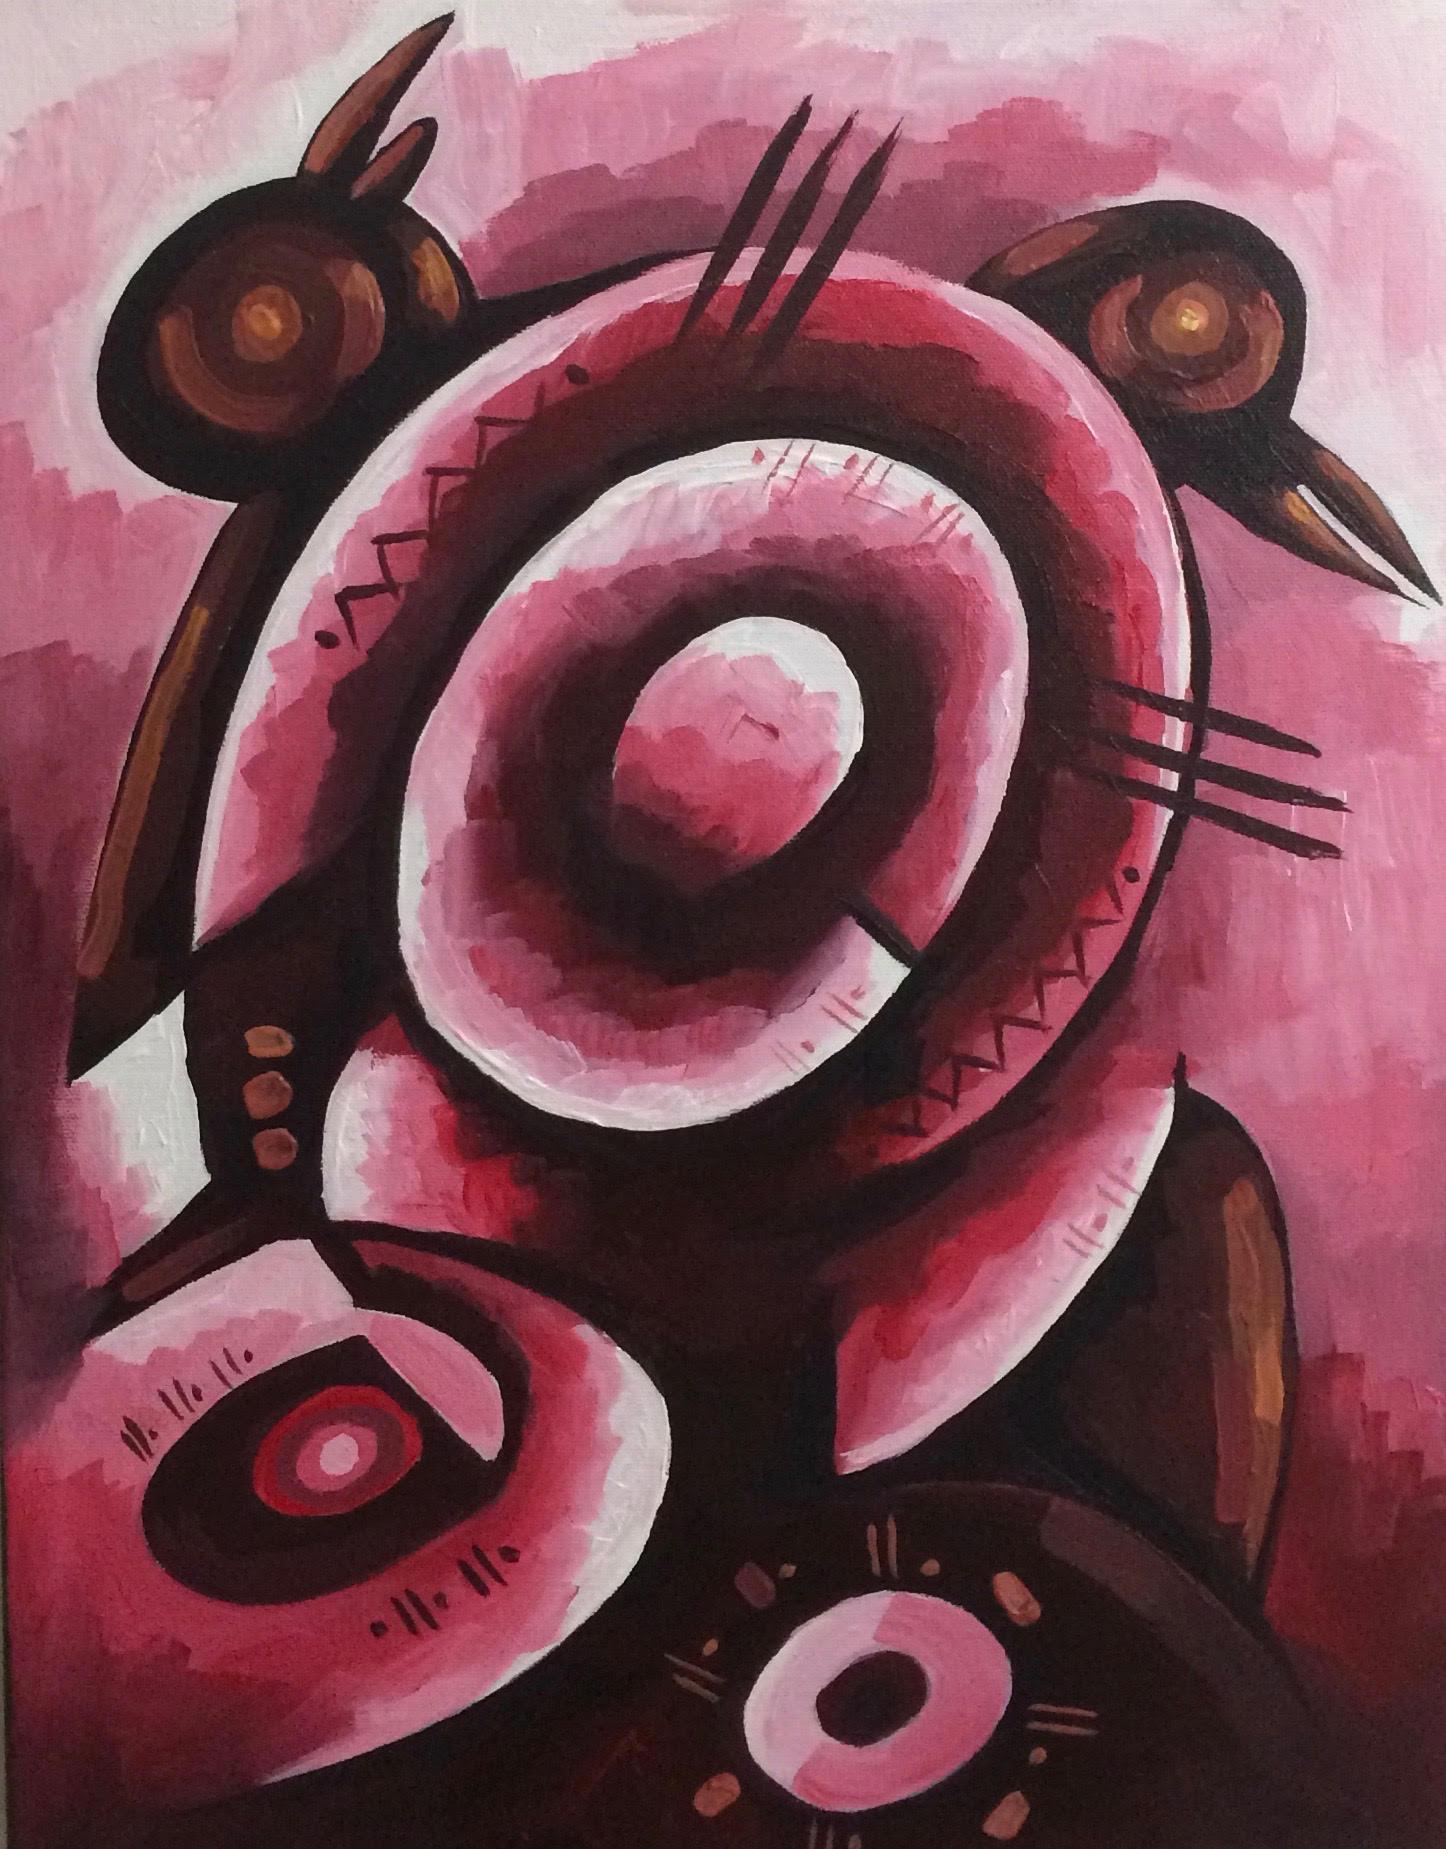 Keita Kwame Kankam,  Busy Birds I, 14 x 18 inches, Acrylic on canvas